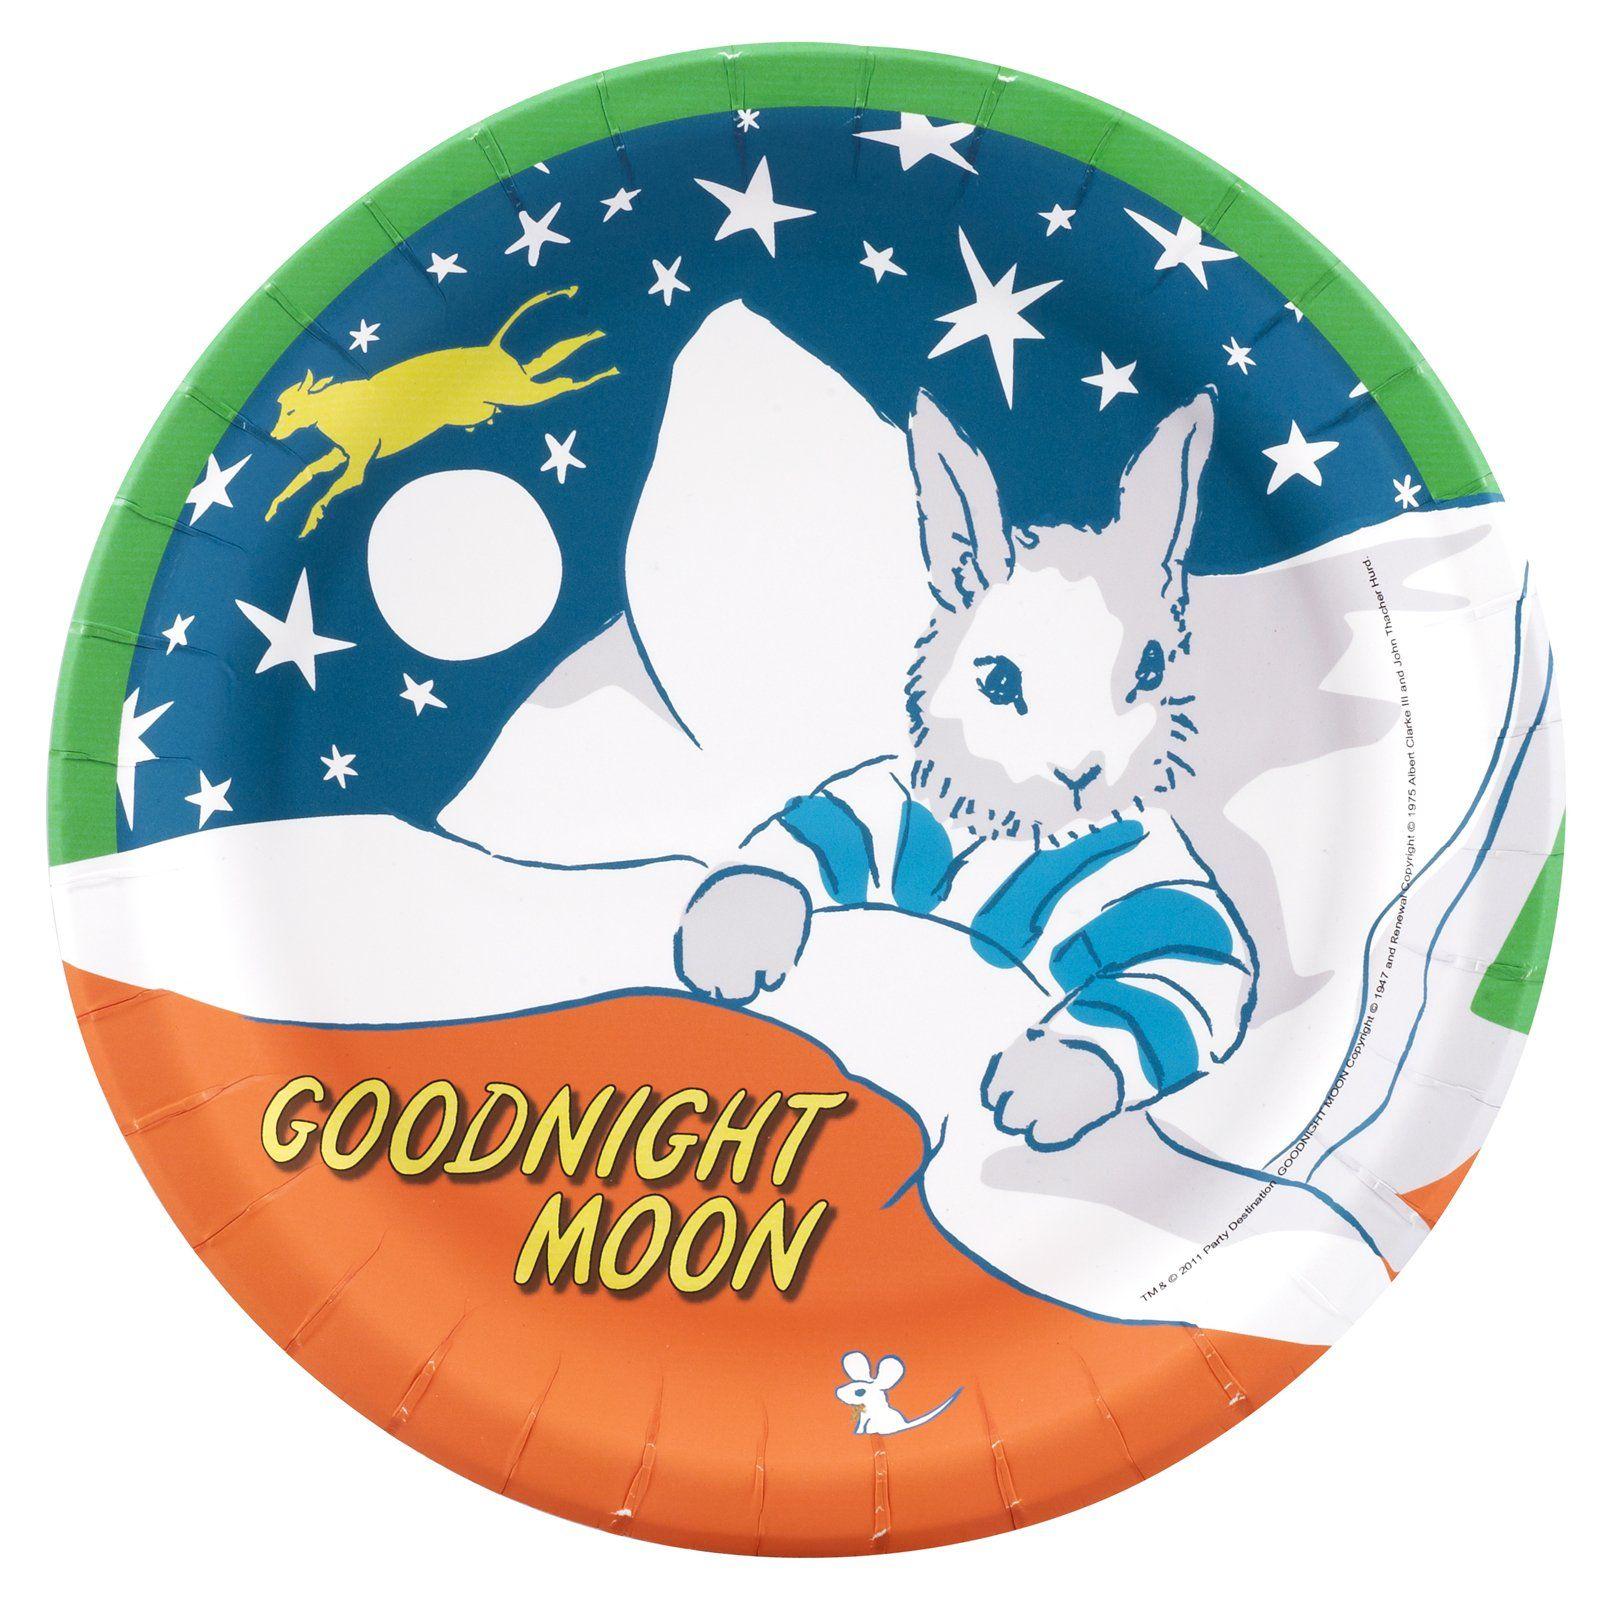 Goodnight moon parties pinterest for Goodnight moon tattoos